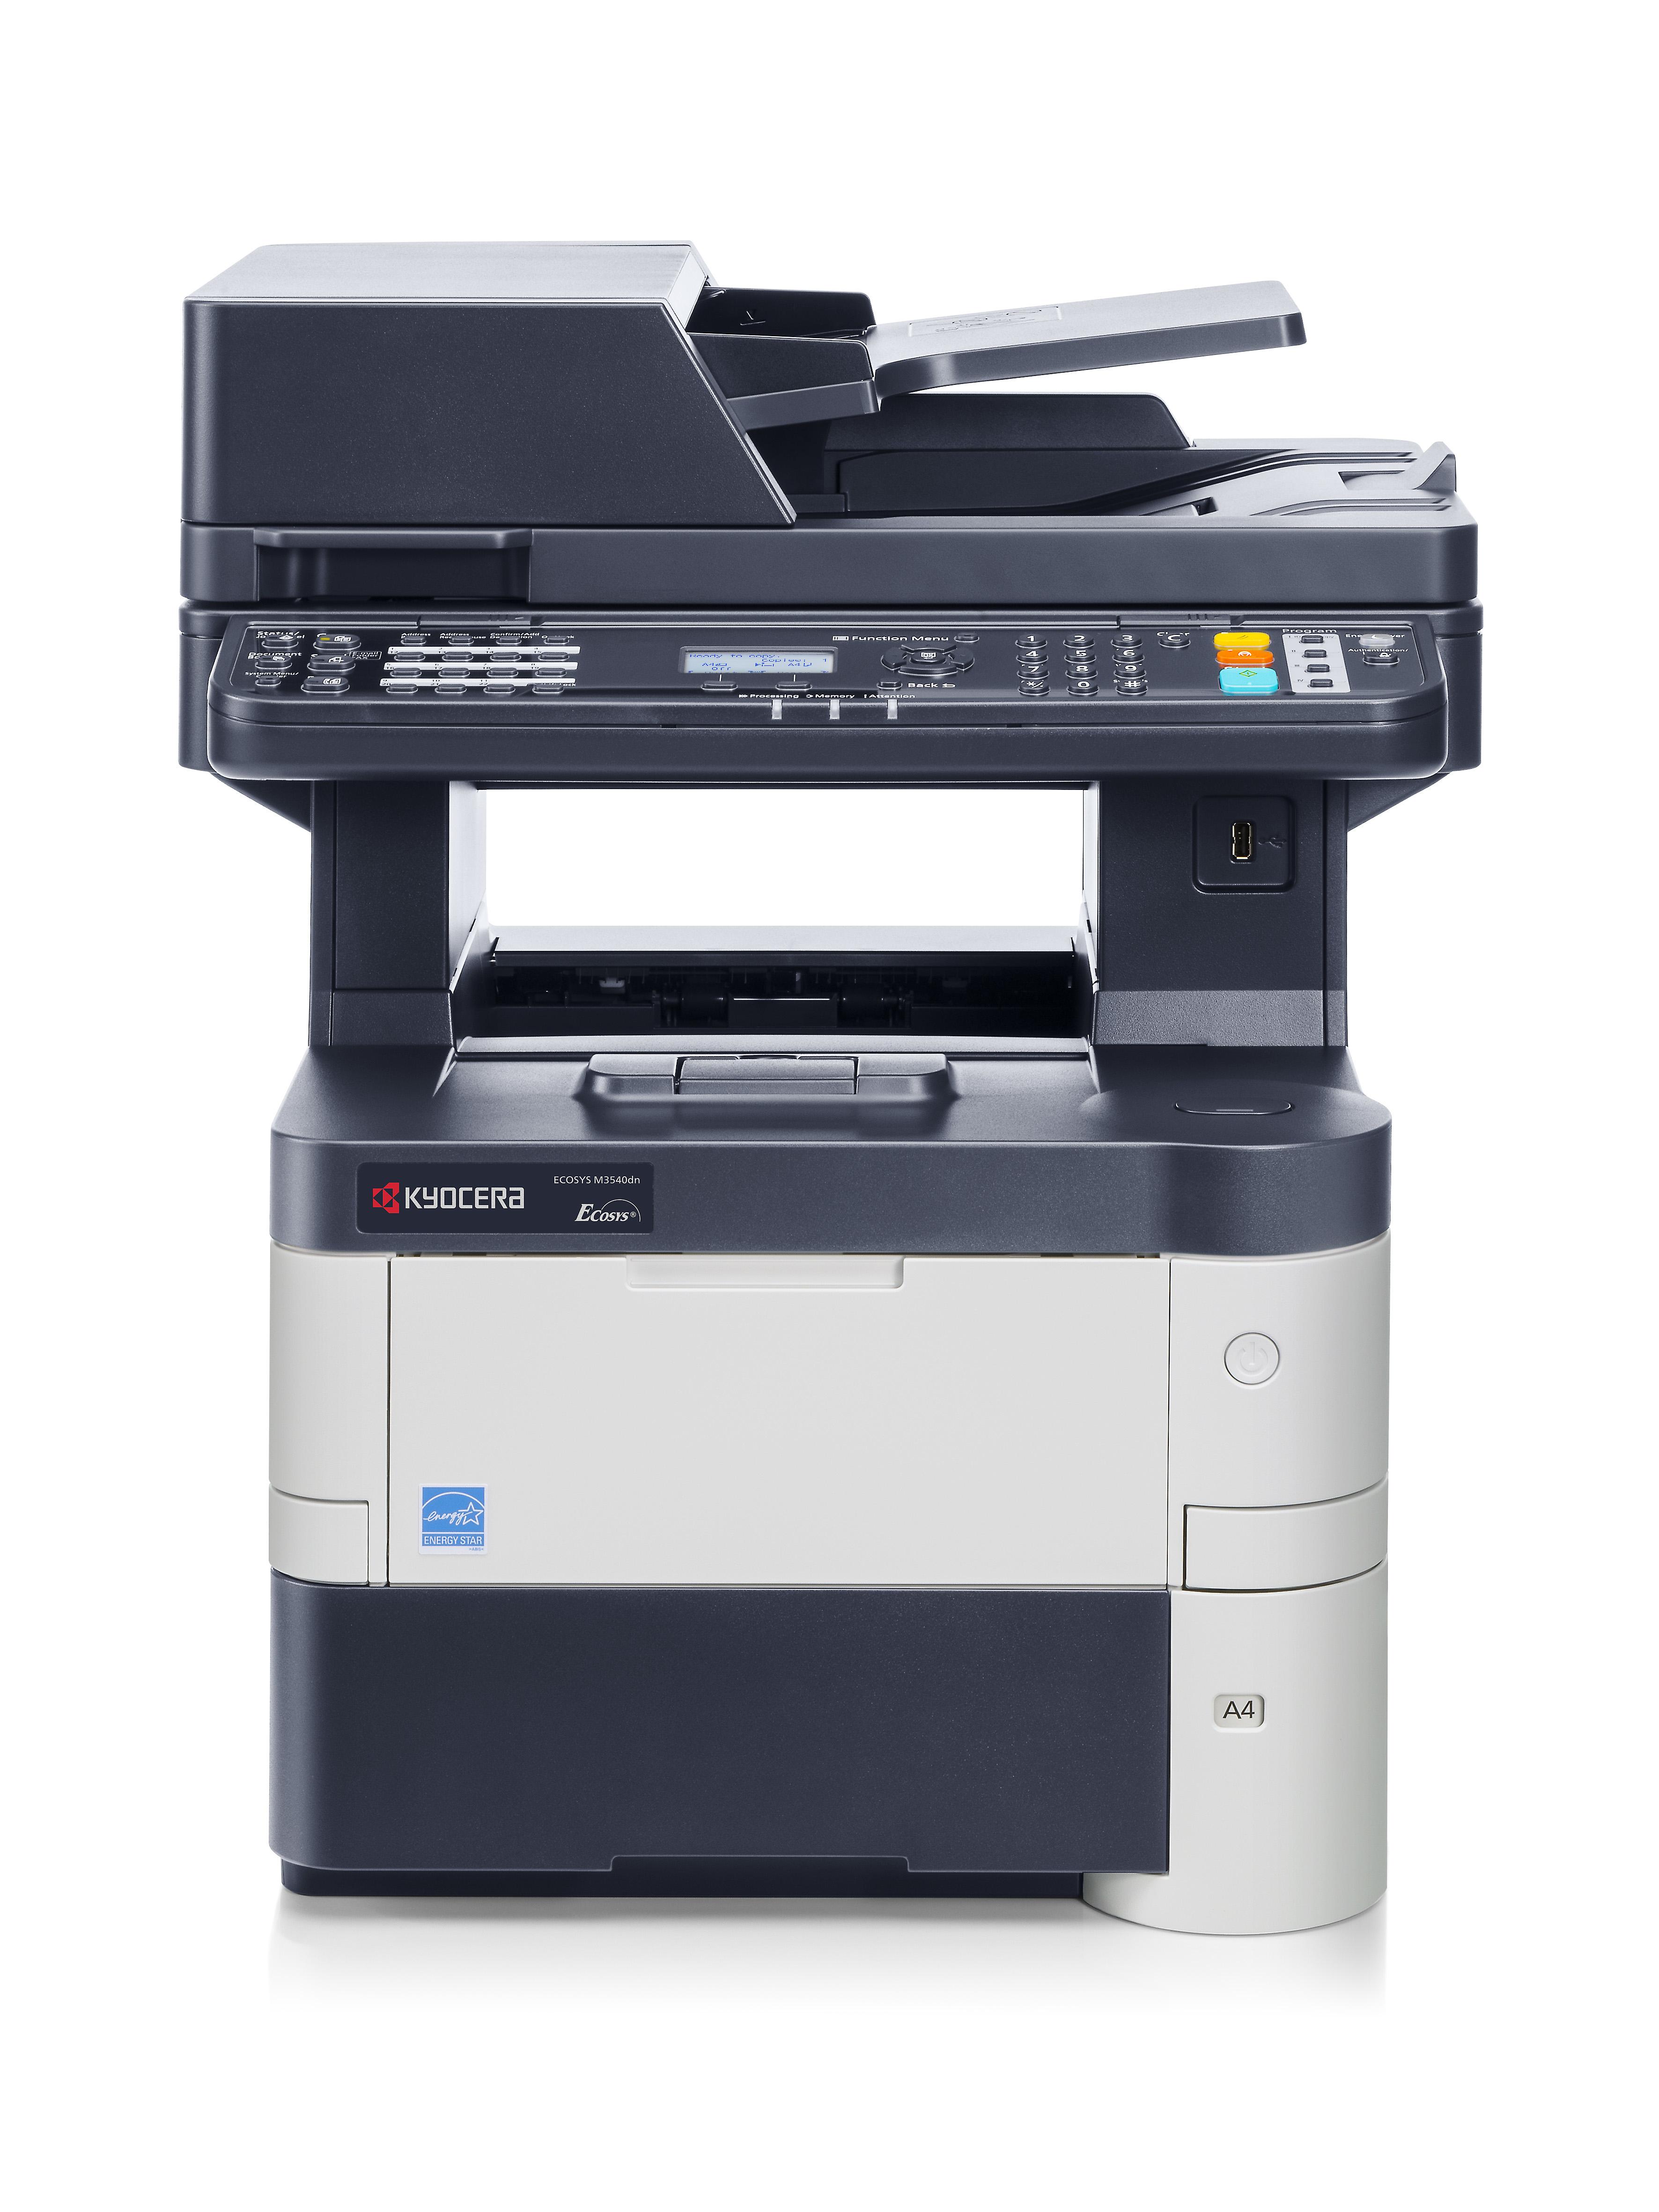 KYOCERA ECOSYS M3540dn/KL3 mono Laserdrucker 40ppm print scan copy fay +KYOLife 3Jahre